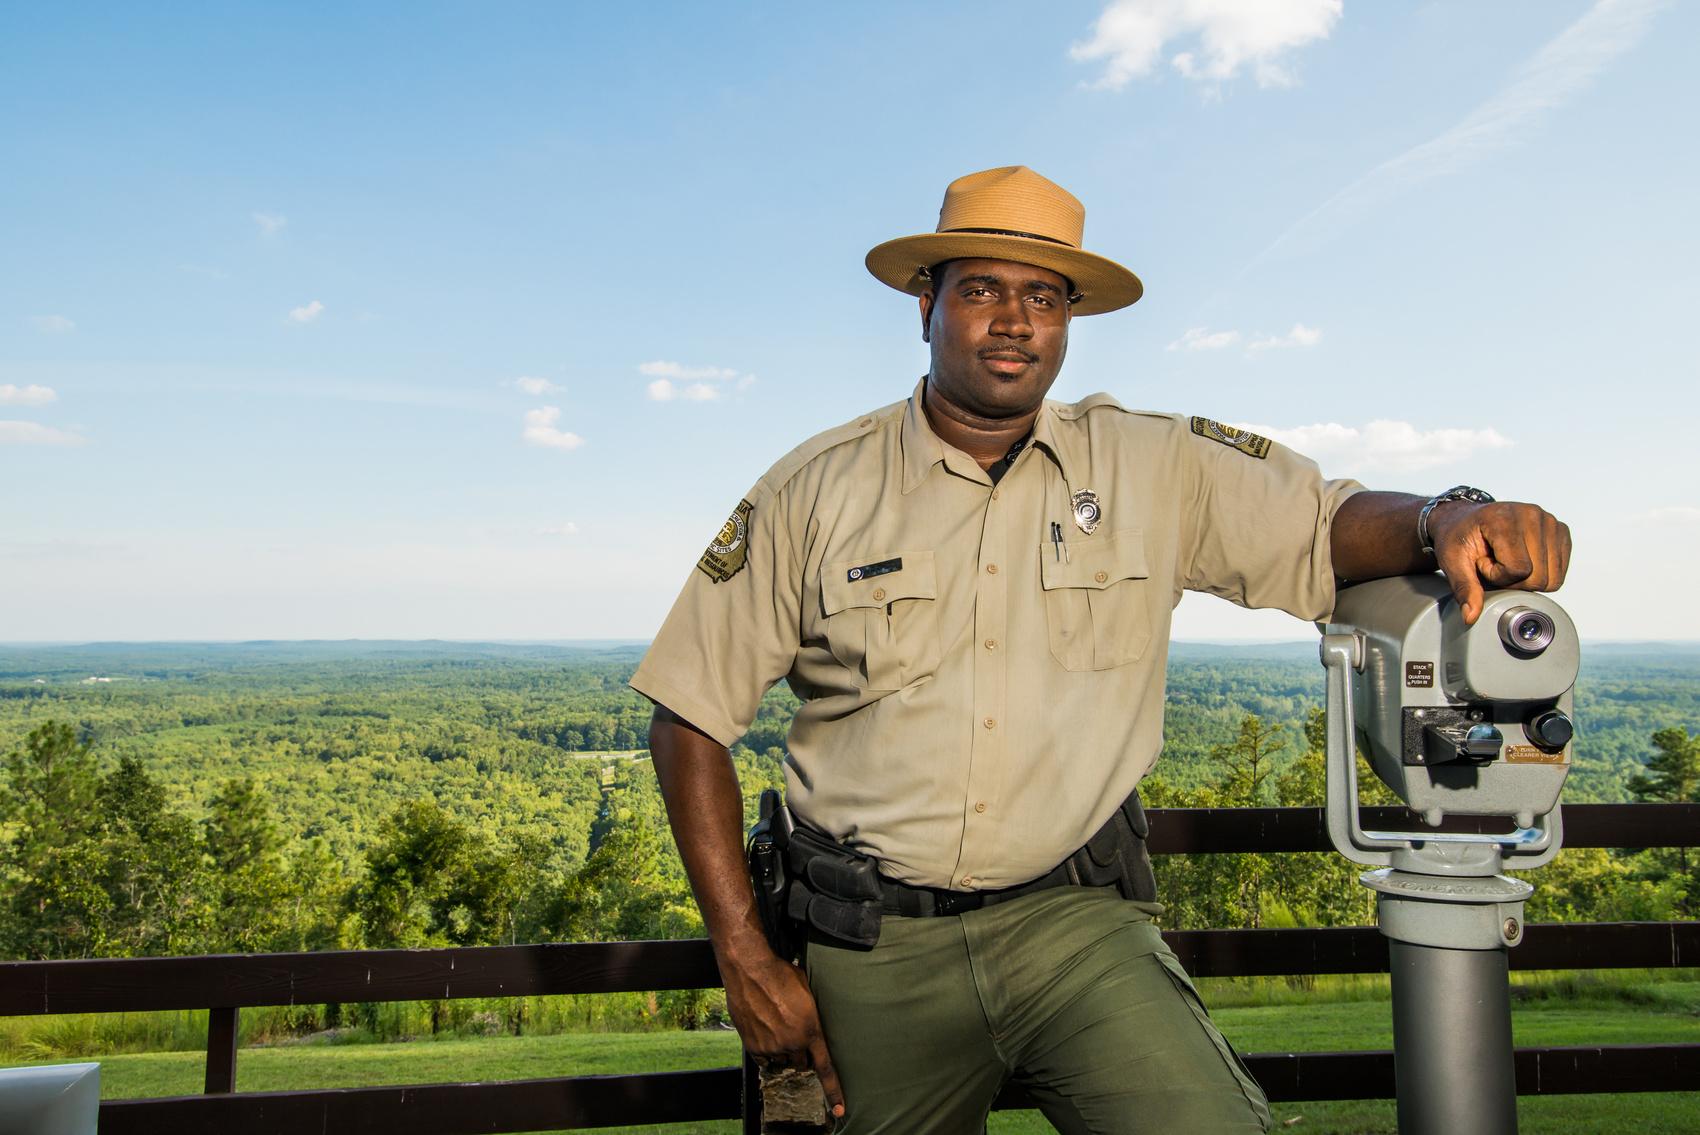 Georgia Lifestyle & Travel Photographer  Pine Mountain, GA Convention & Visitors Bureau